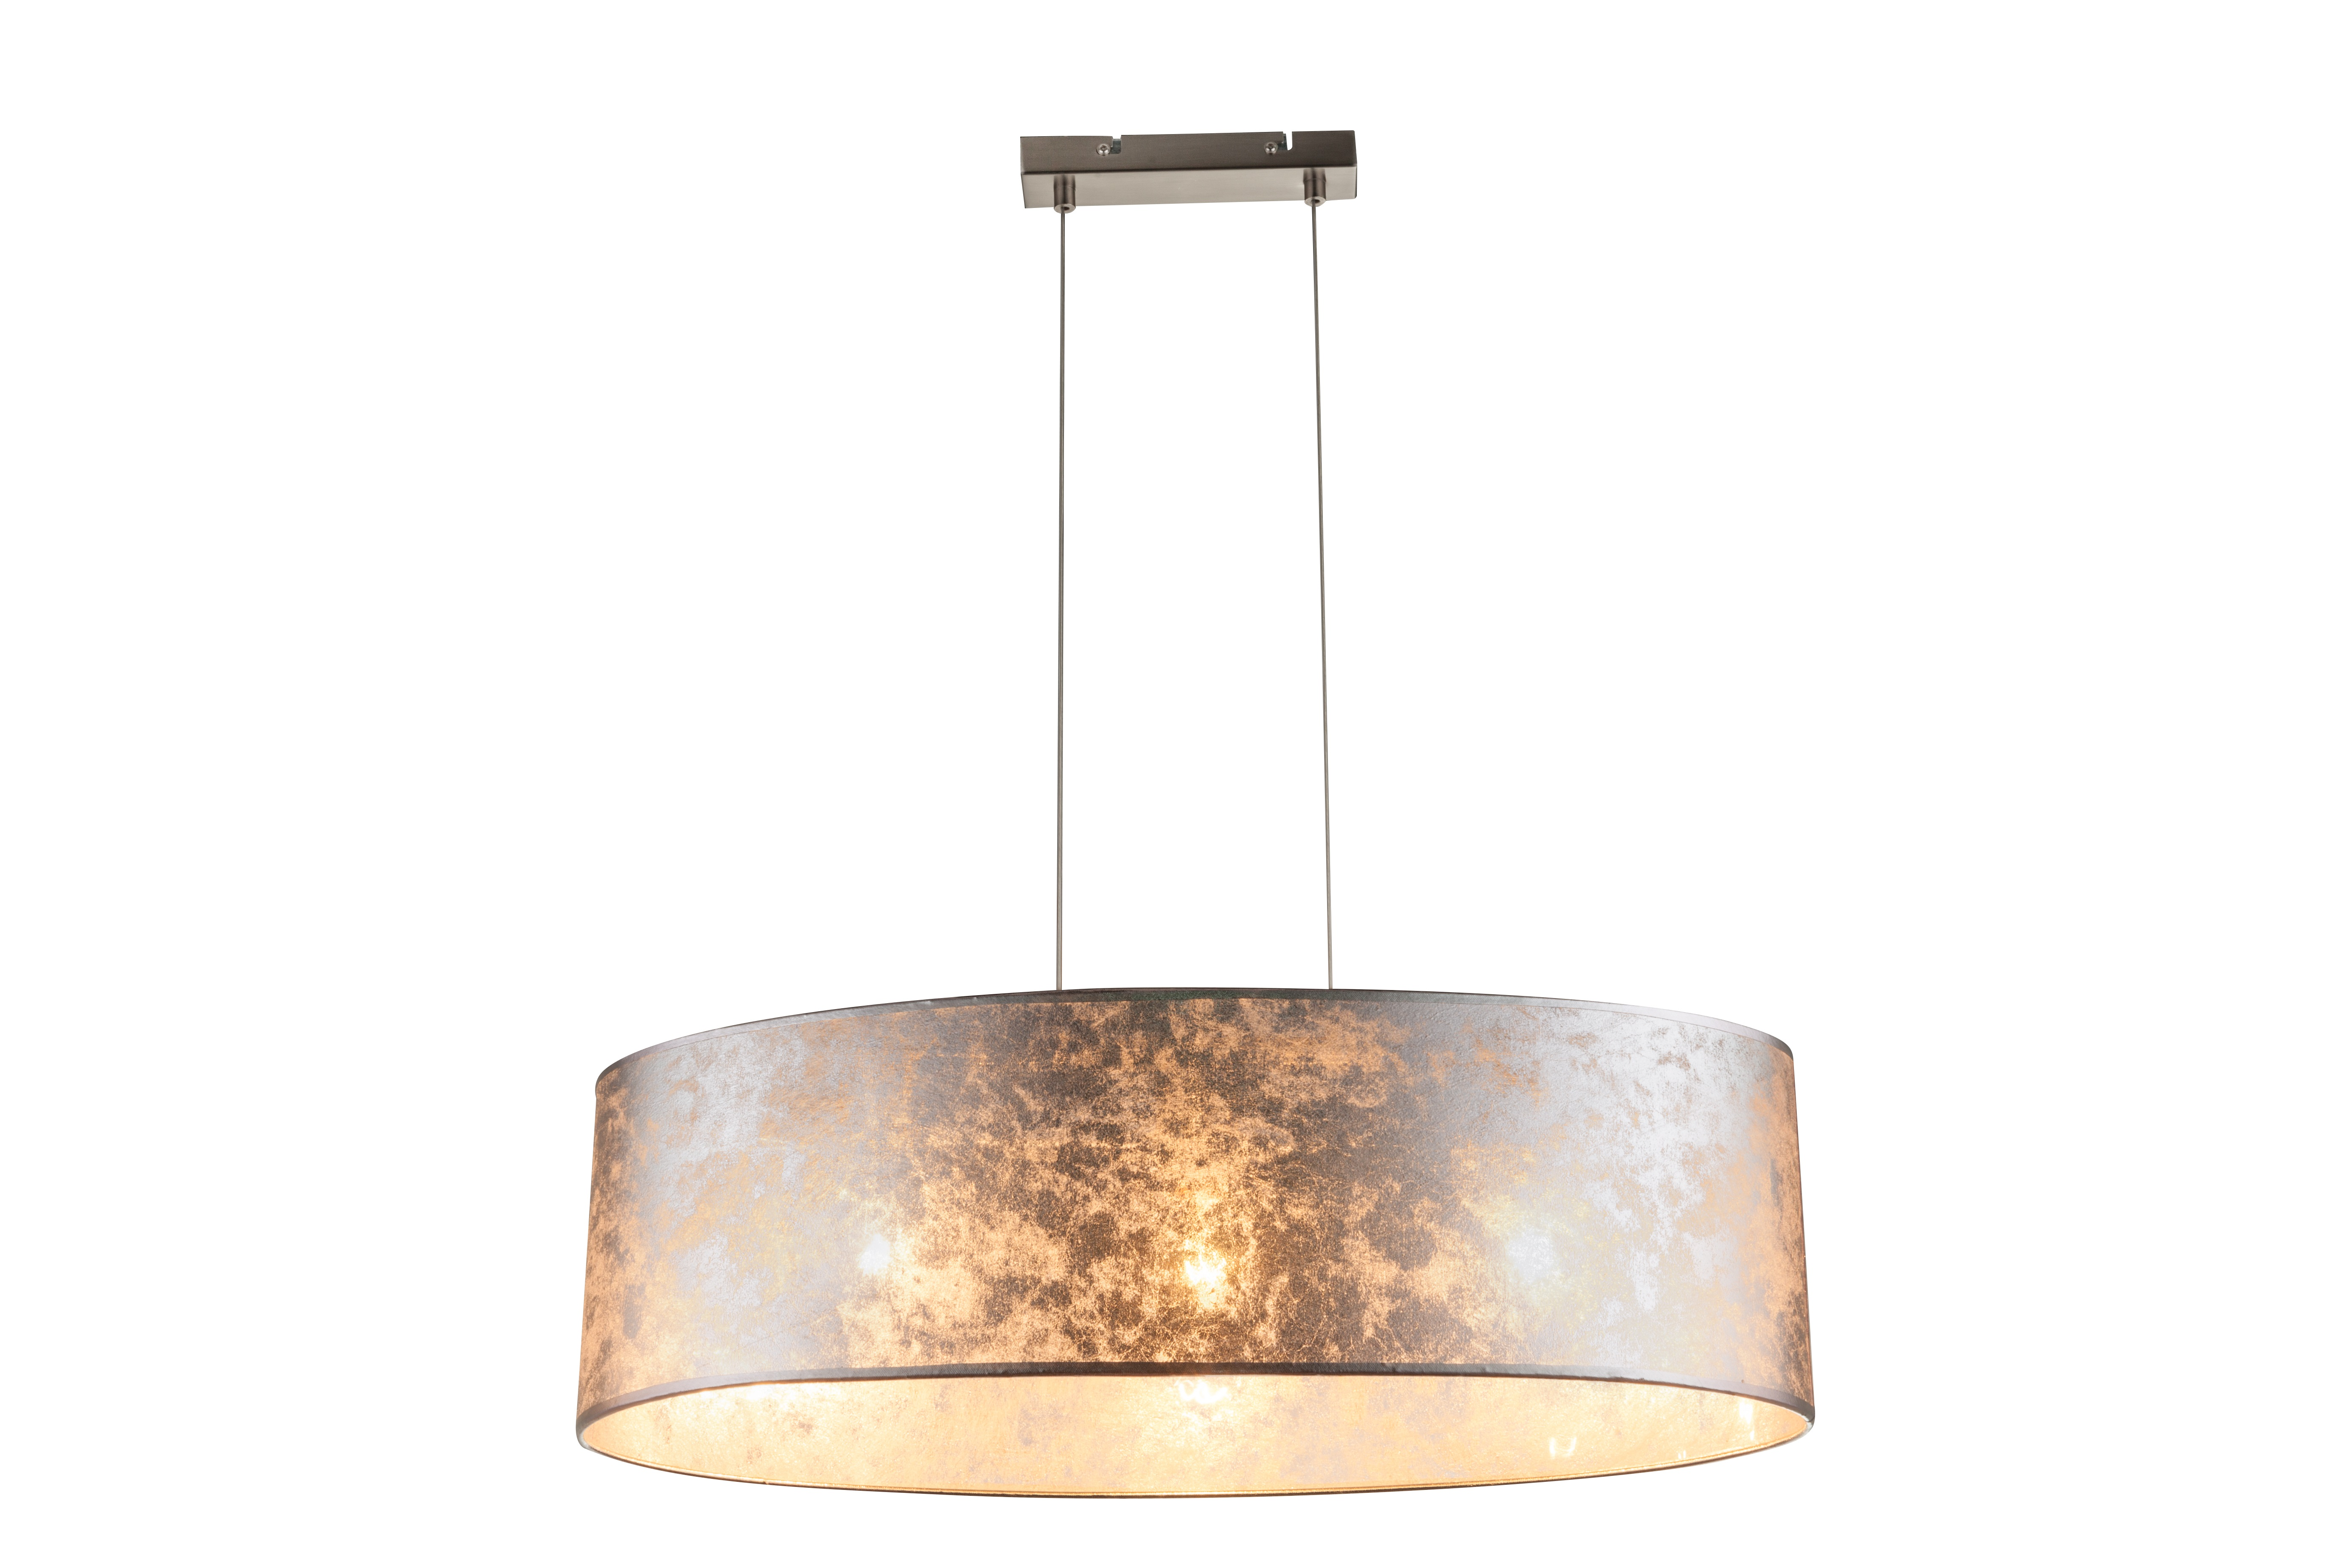 Светильник подвеснойПодвесные светильники<br>Тип цоколя: E27Мощность: 60WКол-во ламп: 3 (нет в комплекте)<br><br>kit: None<br>gender: None